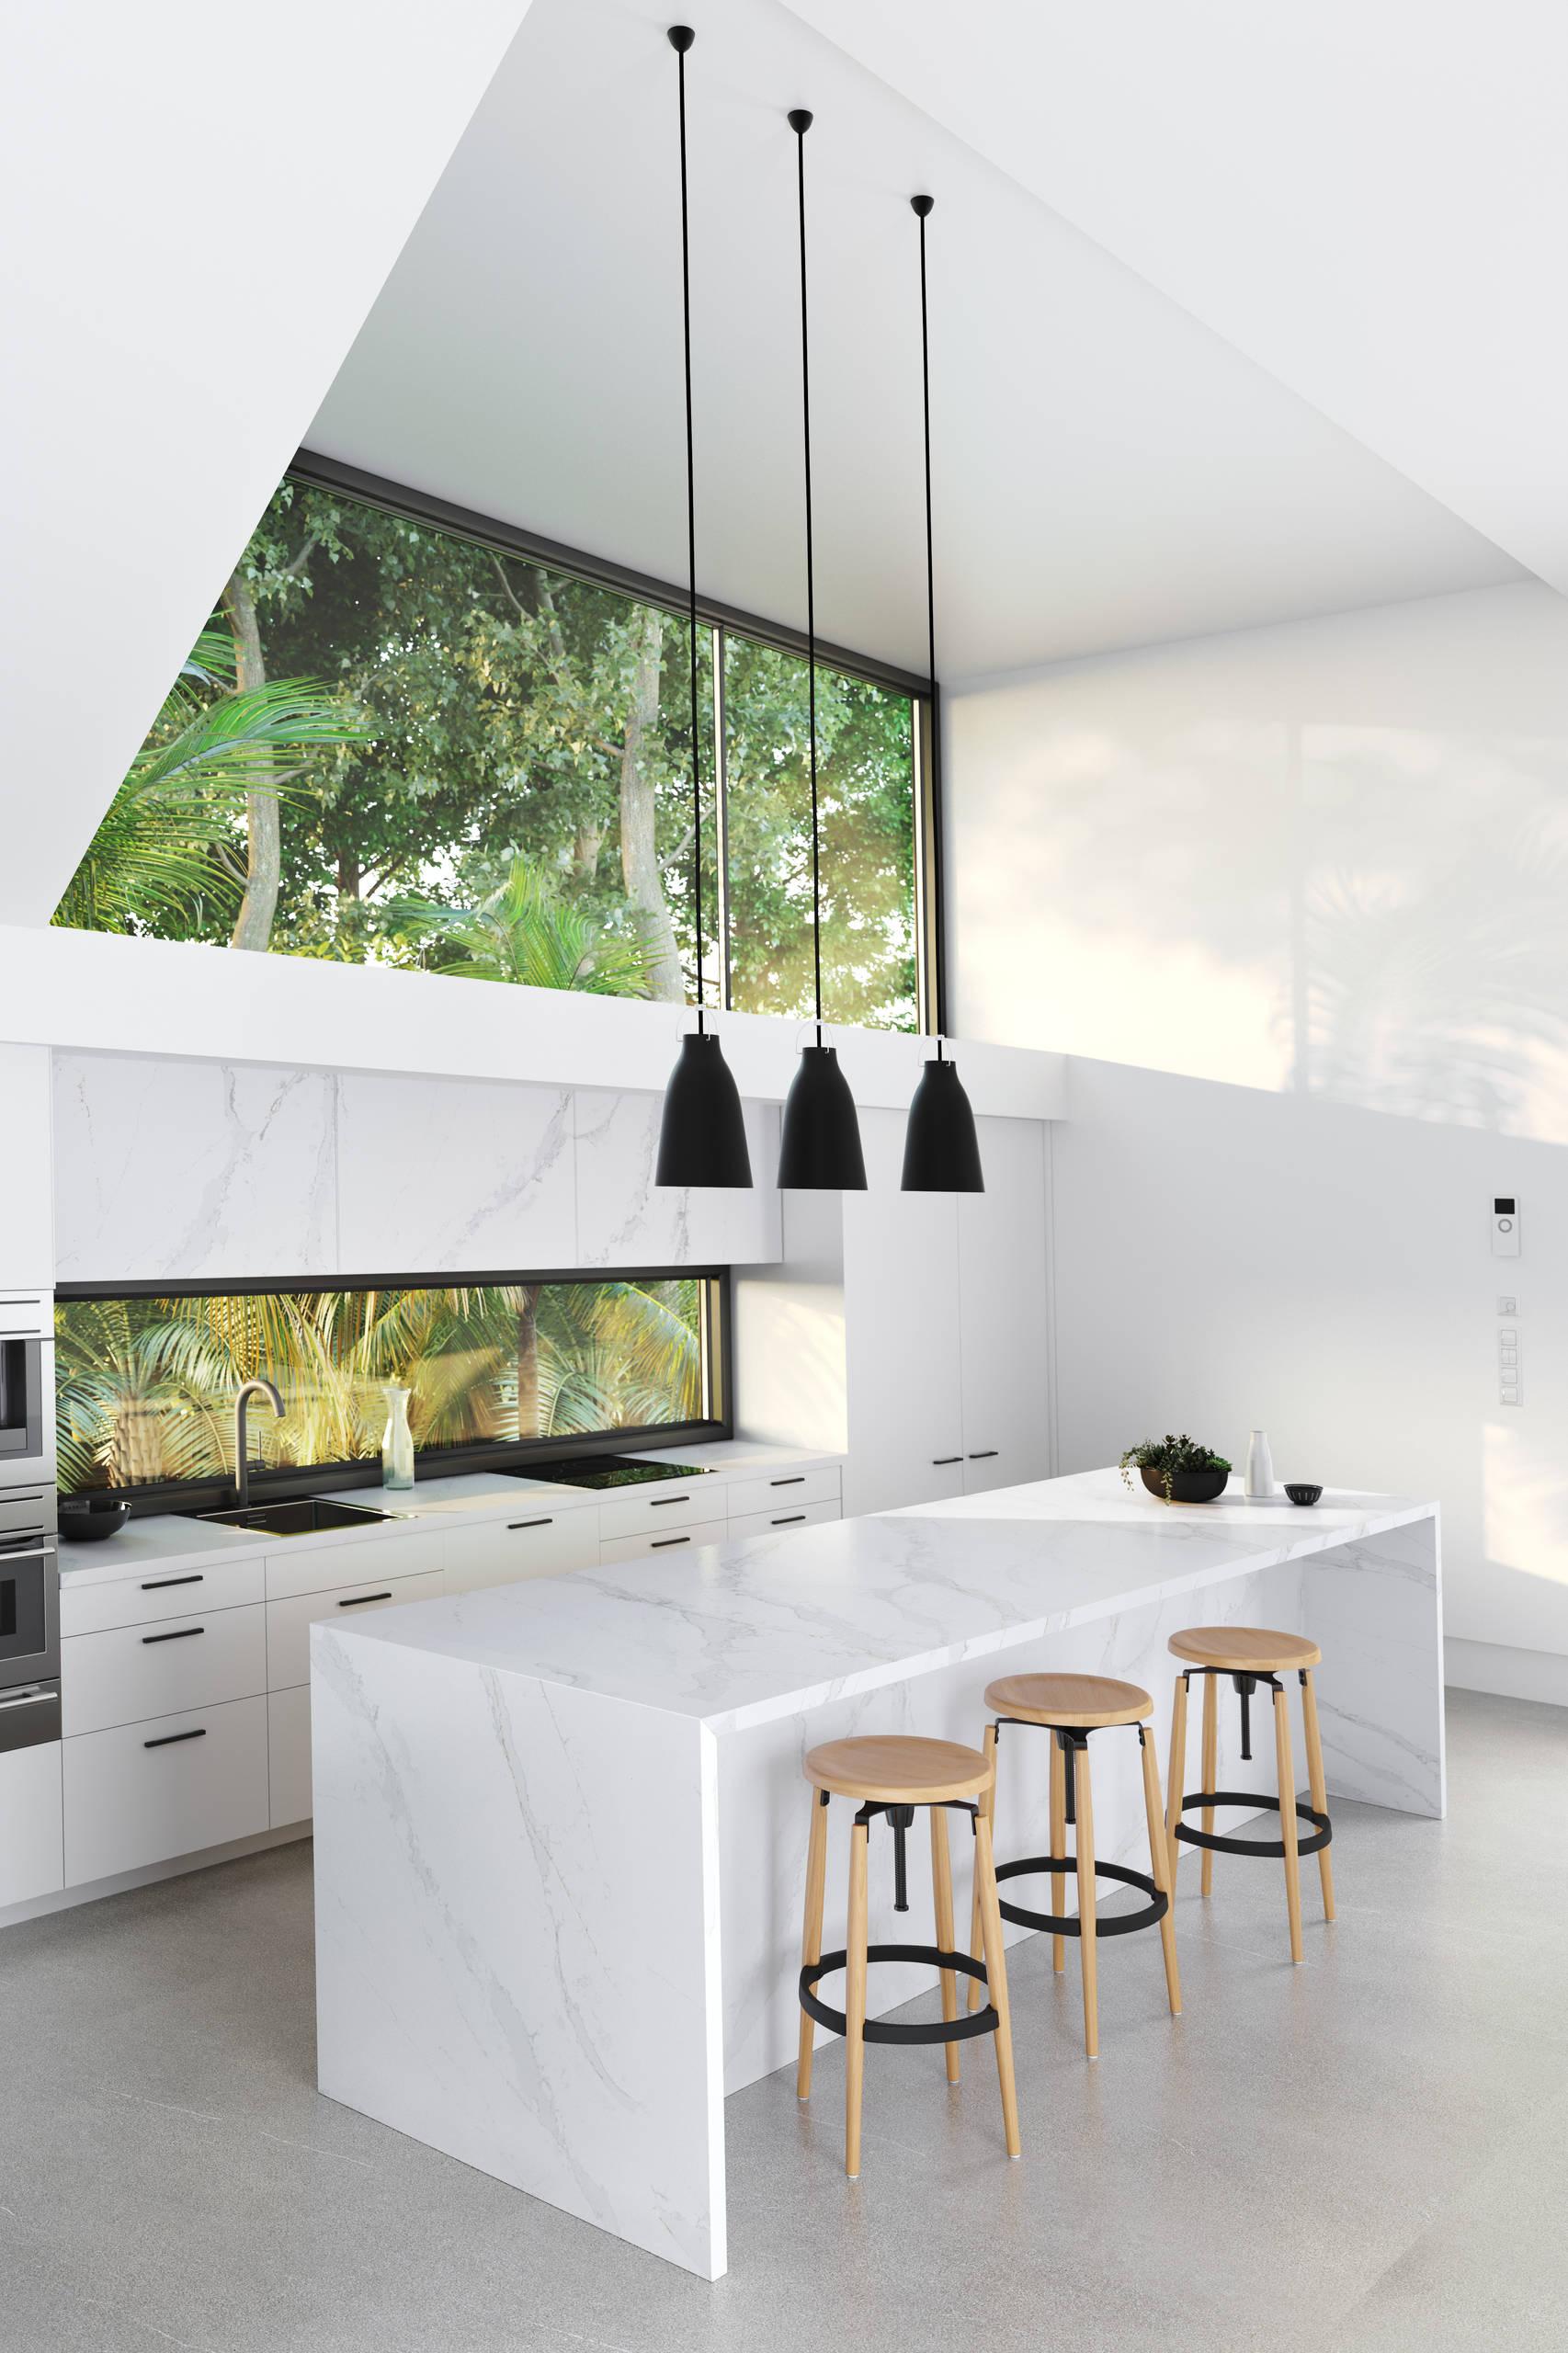 75 Beautiful Modern Kitchen Pictures Ideas April 2021 Houzz